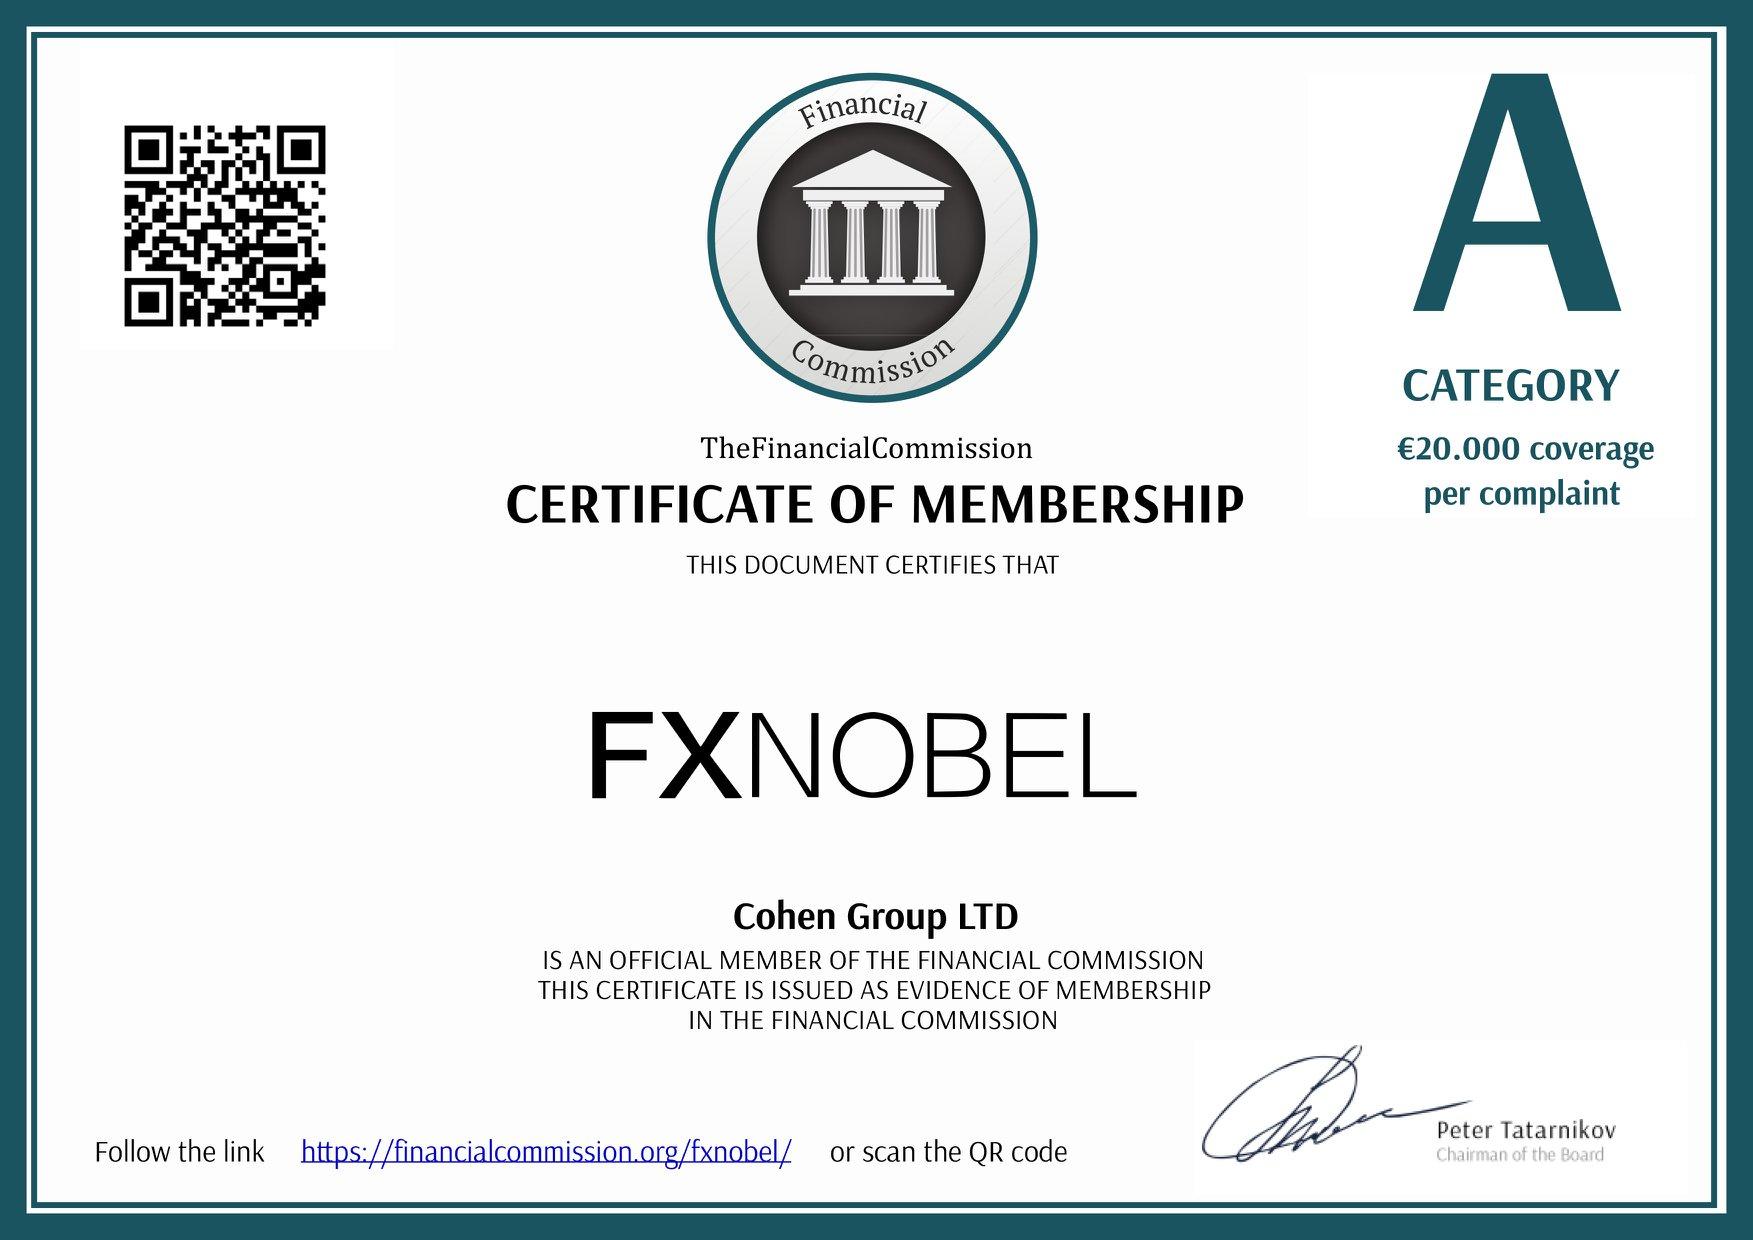 Fxnobel клиентfinancialcommission?